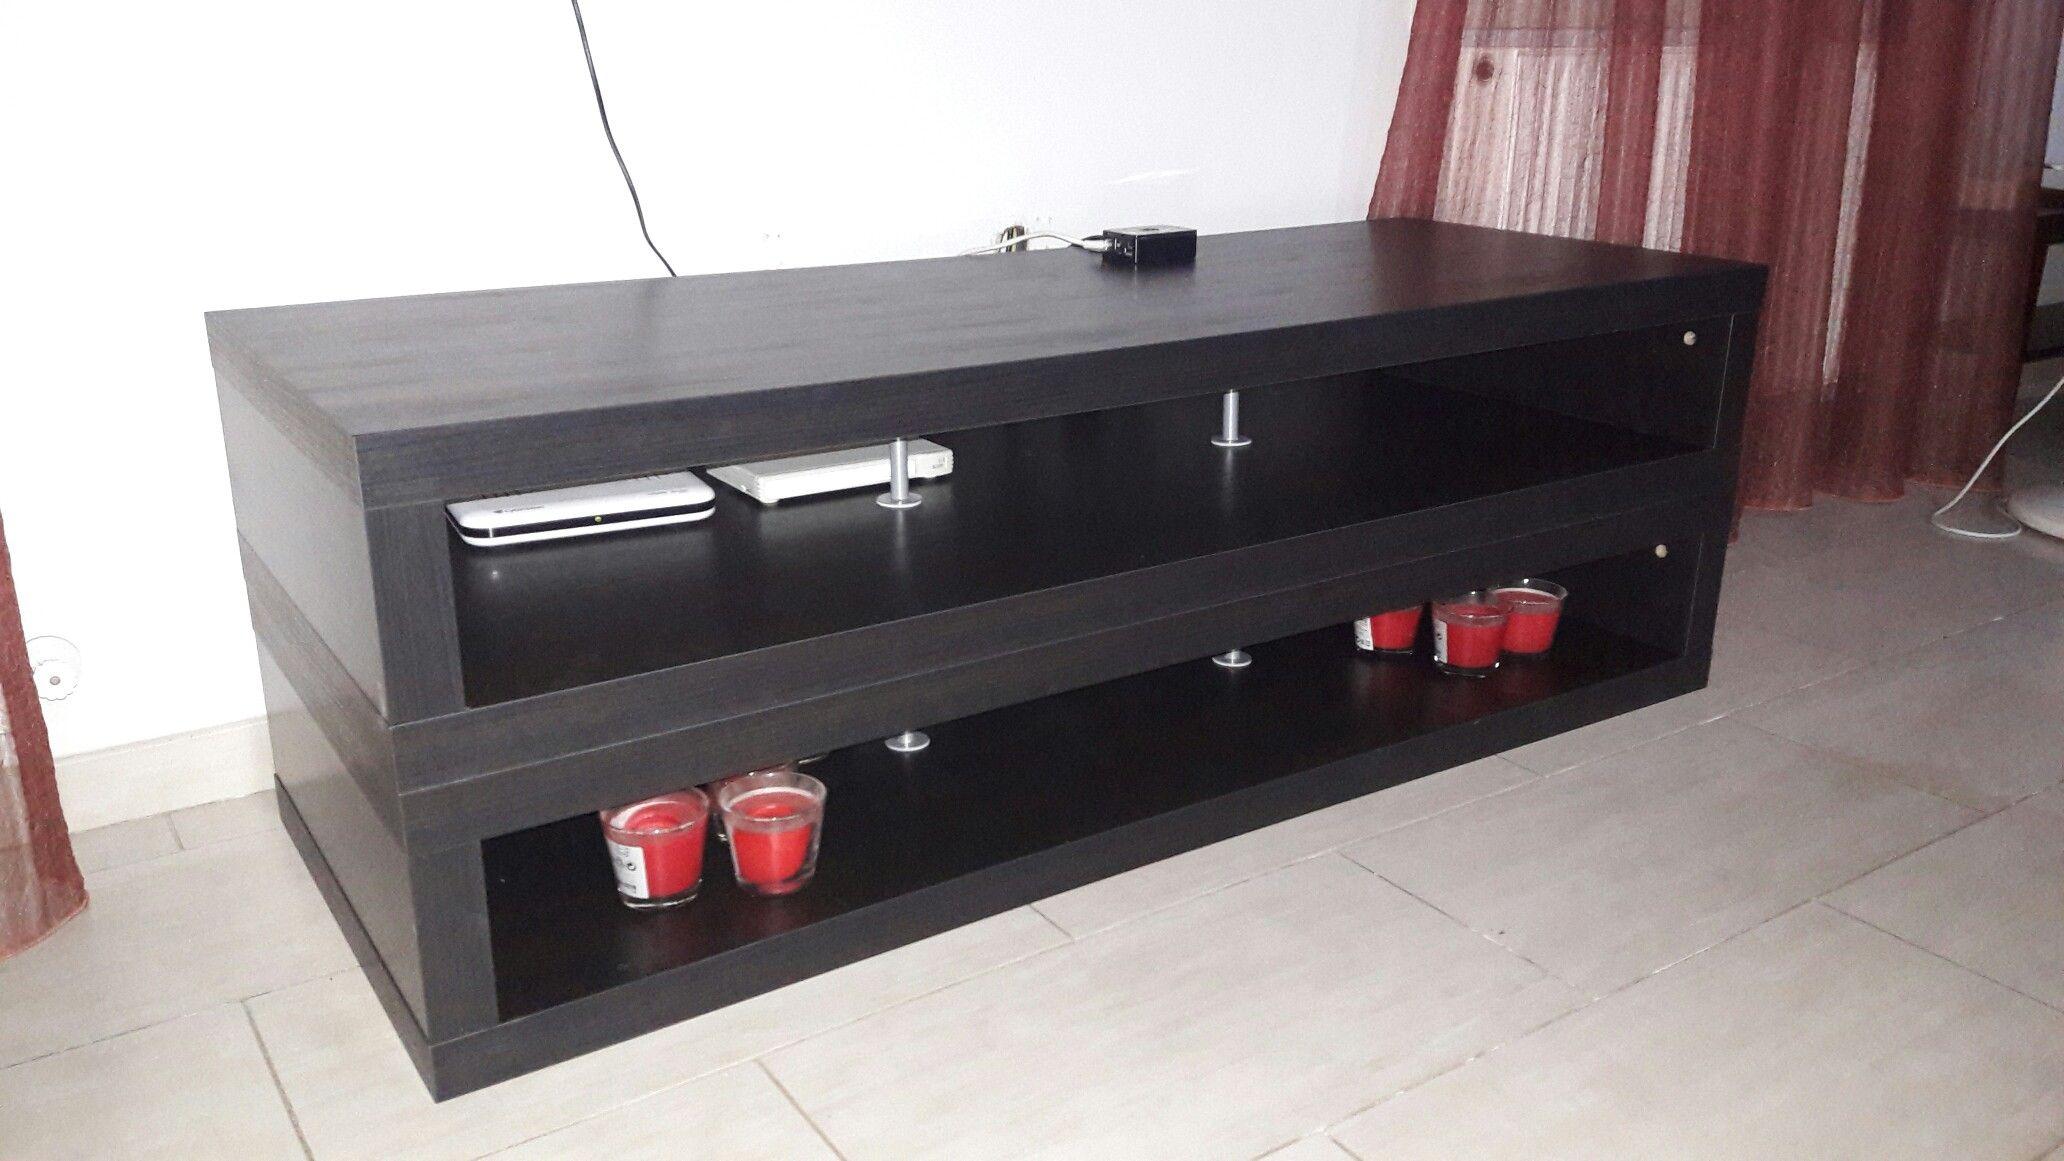 Tv möbel ikea lack  Ikea Lack TV Stand hack | Home Decoration & DIY | Pinterest | TV ...